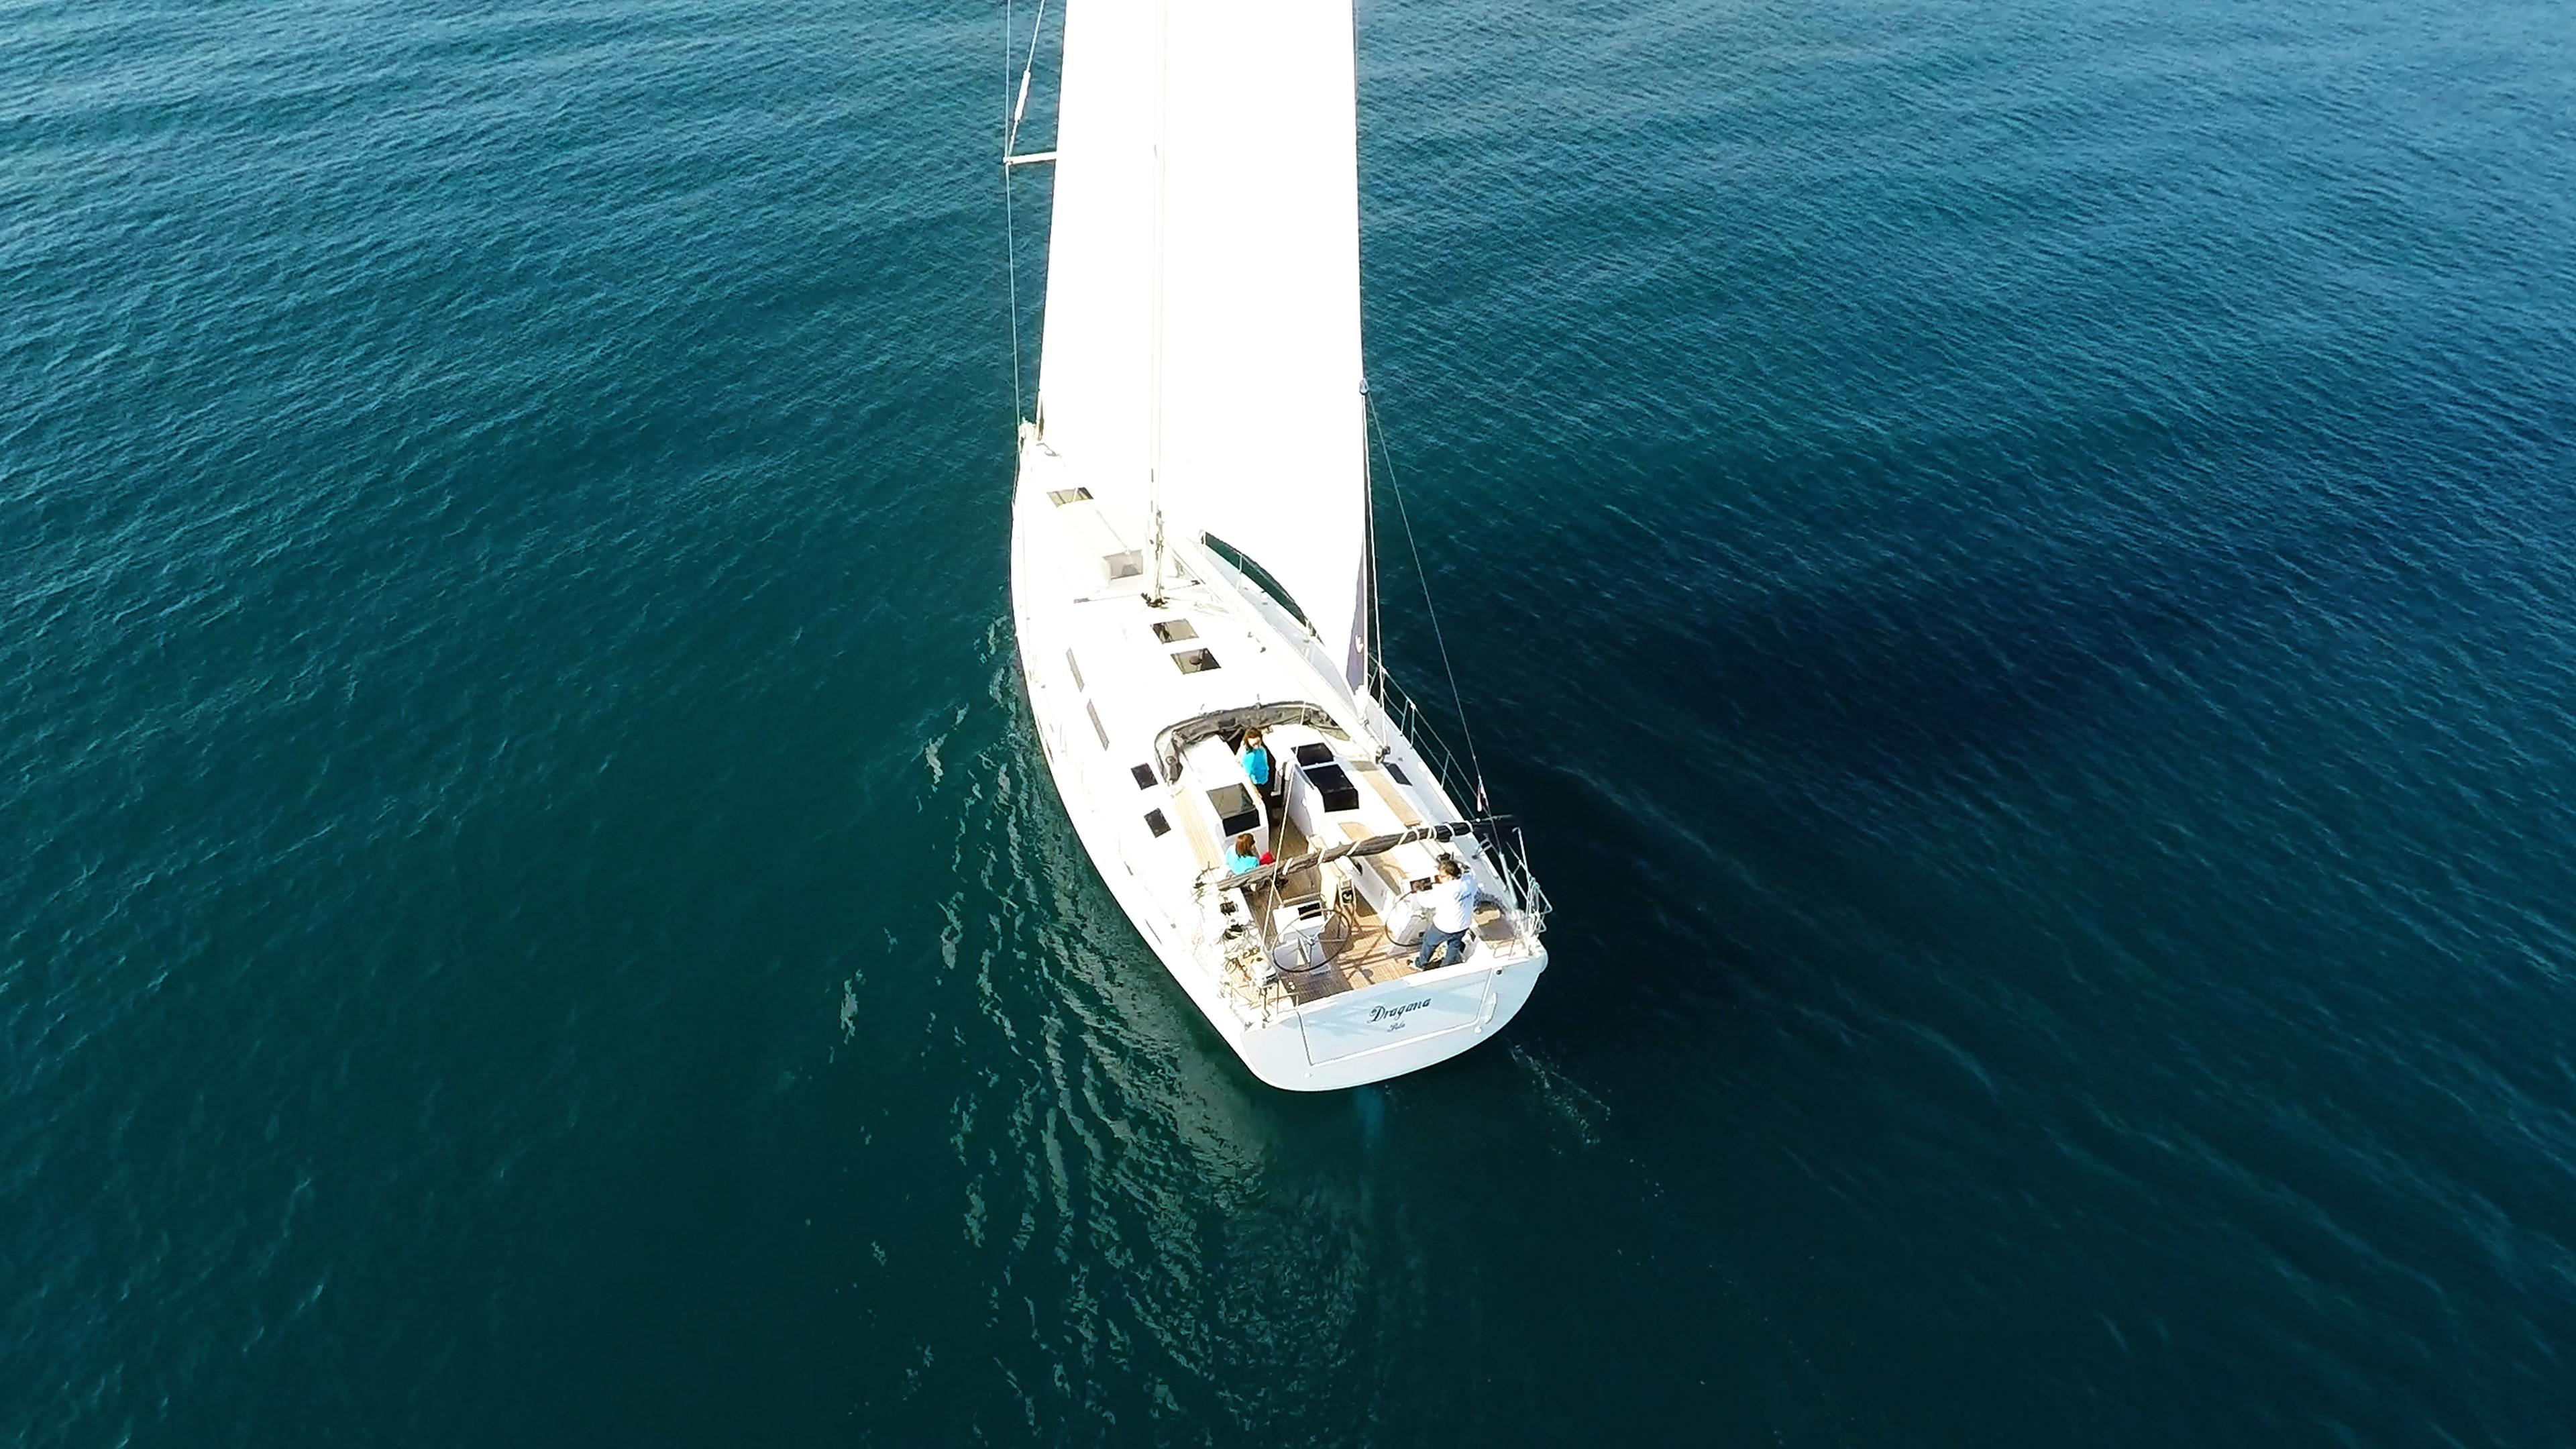 barcha a vela Hanse 505 yacht a vela aereo ponte pozzetto